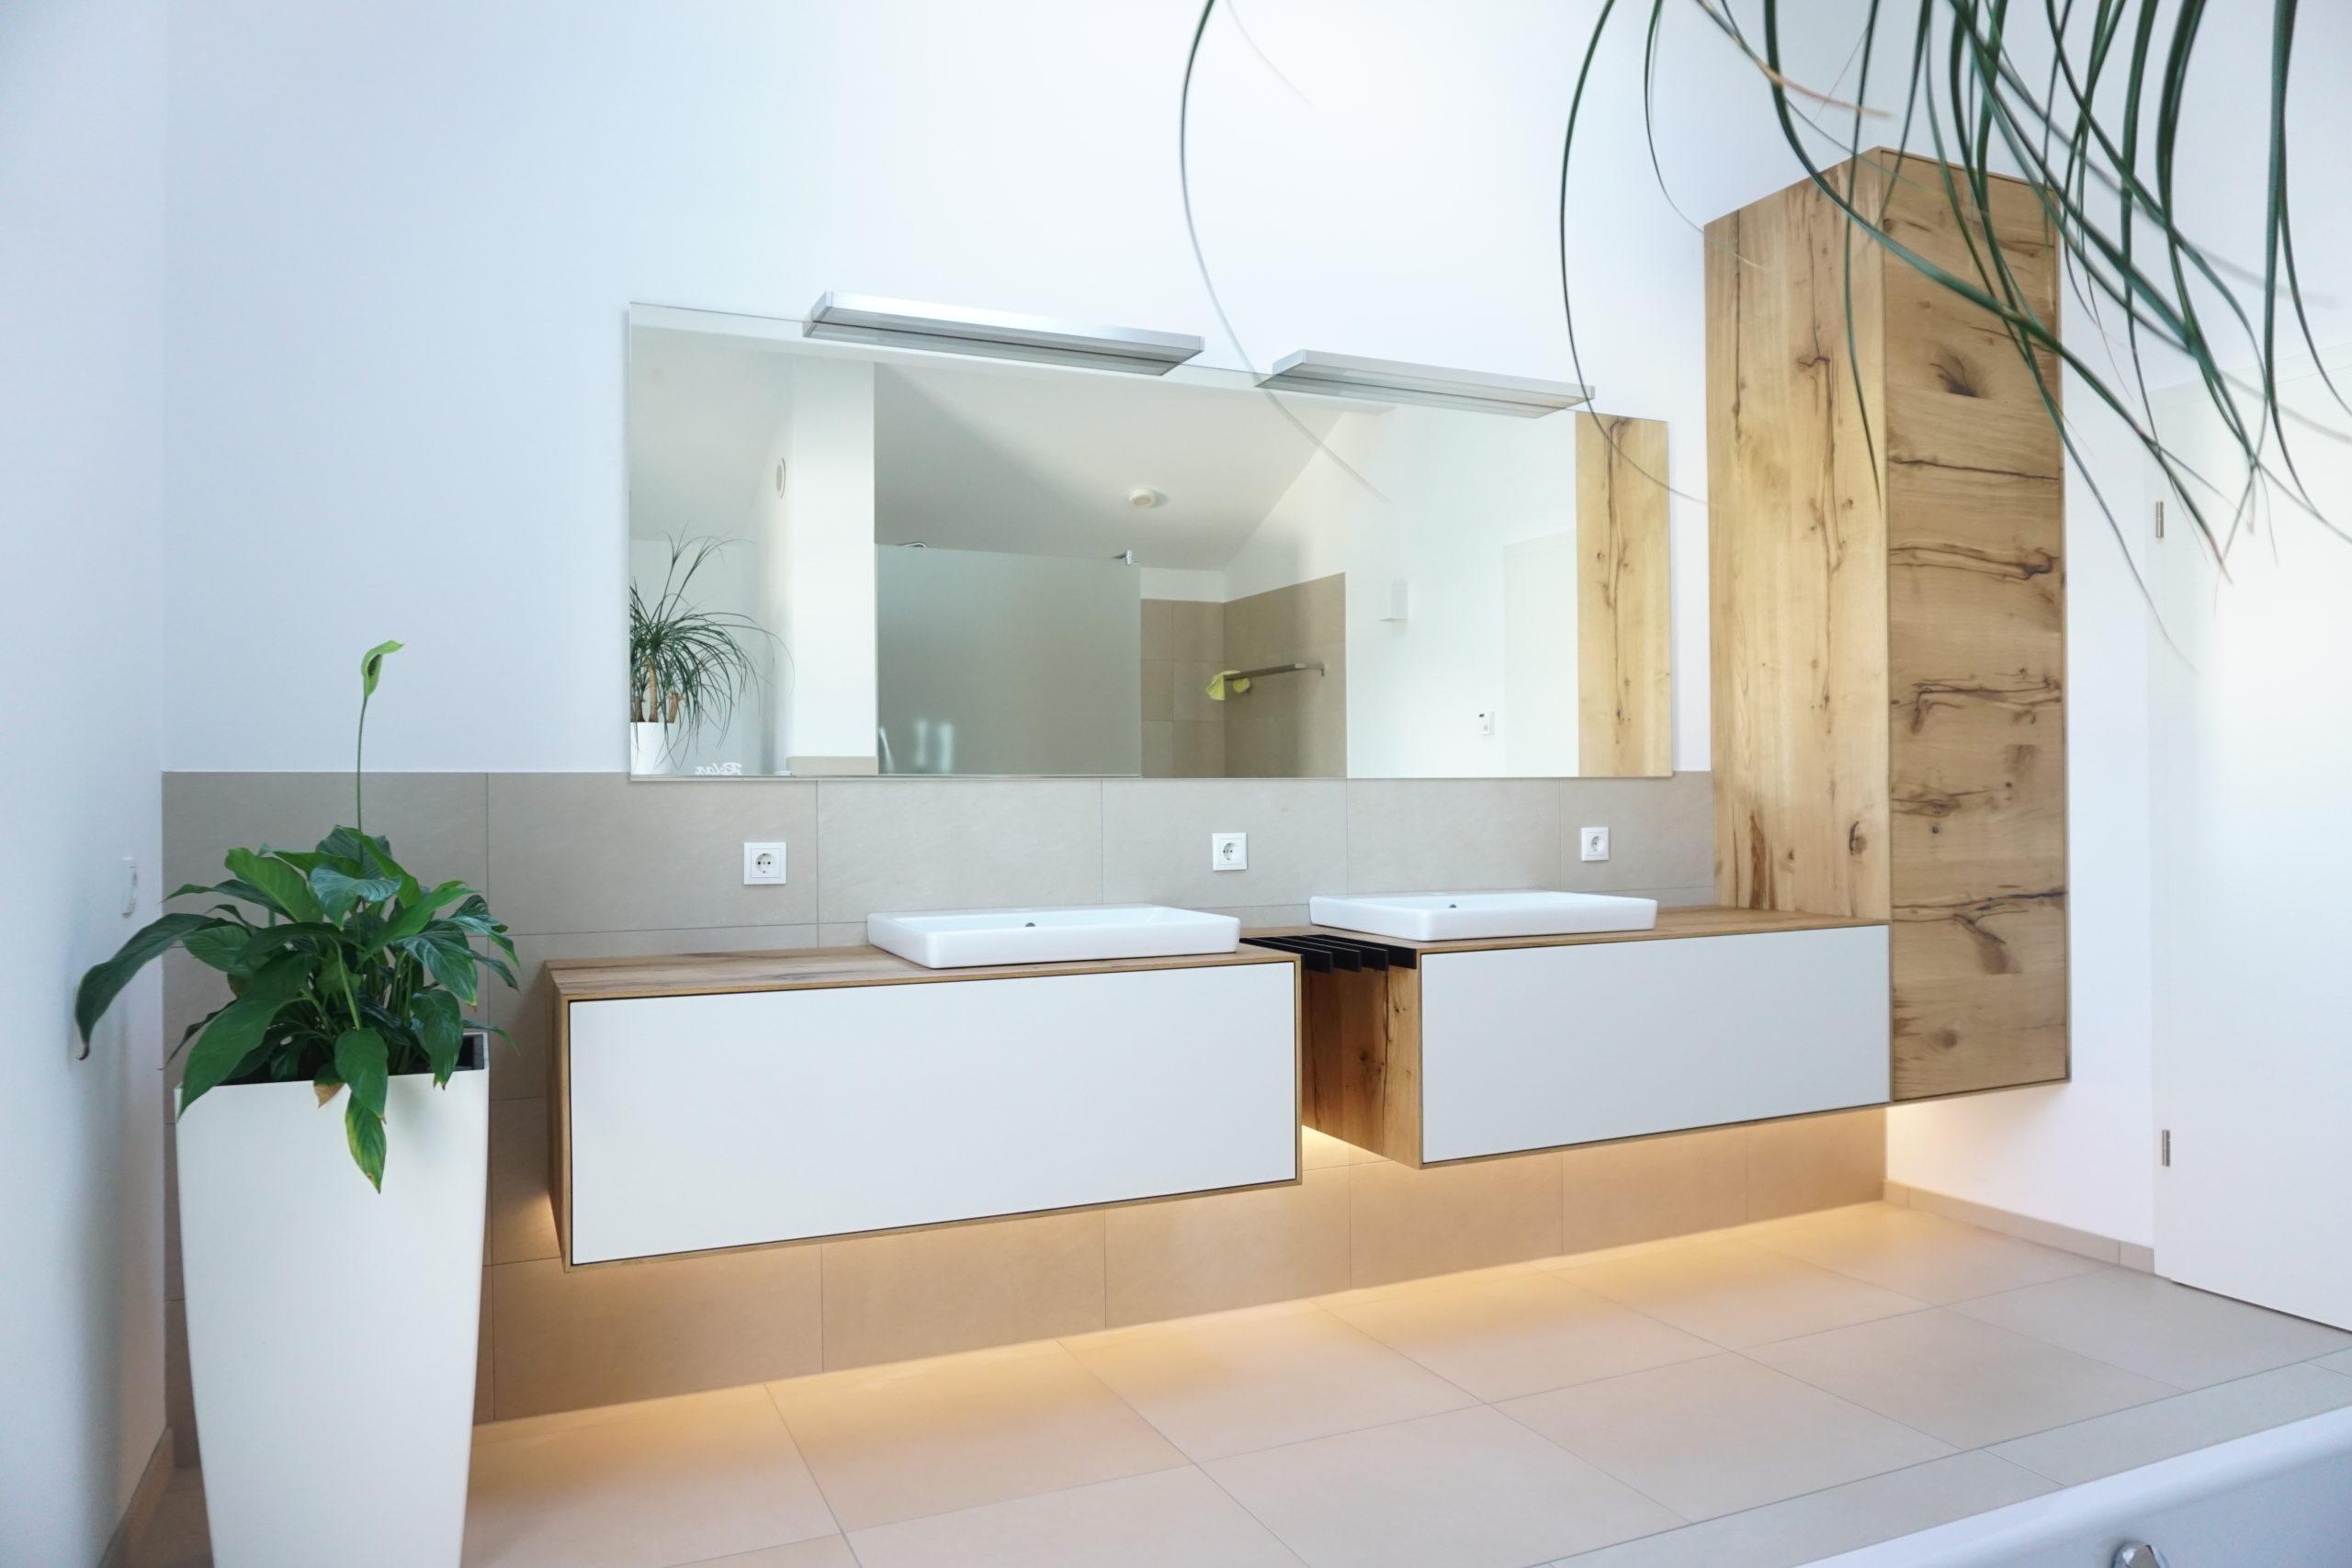 Badezimmer Möbel Ailingen Bodensee